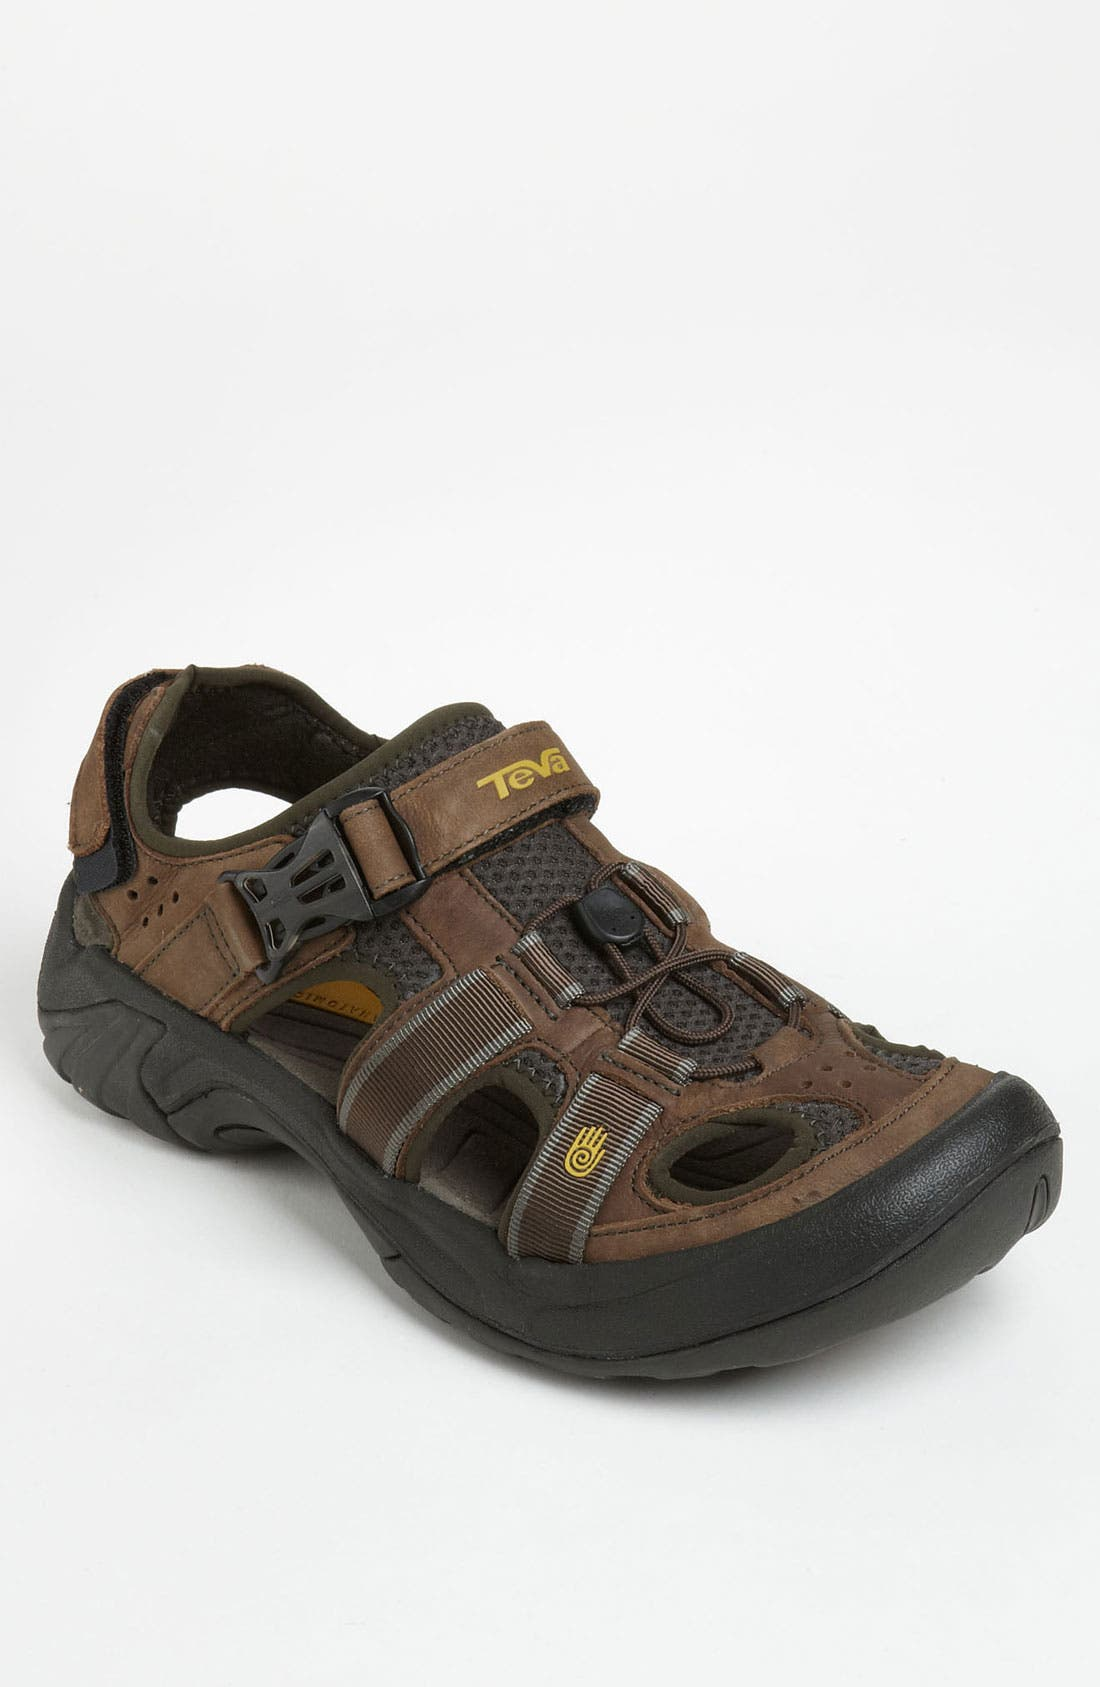 Alternate Image 1 Selected - Teva 'Omnium' Sandal